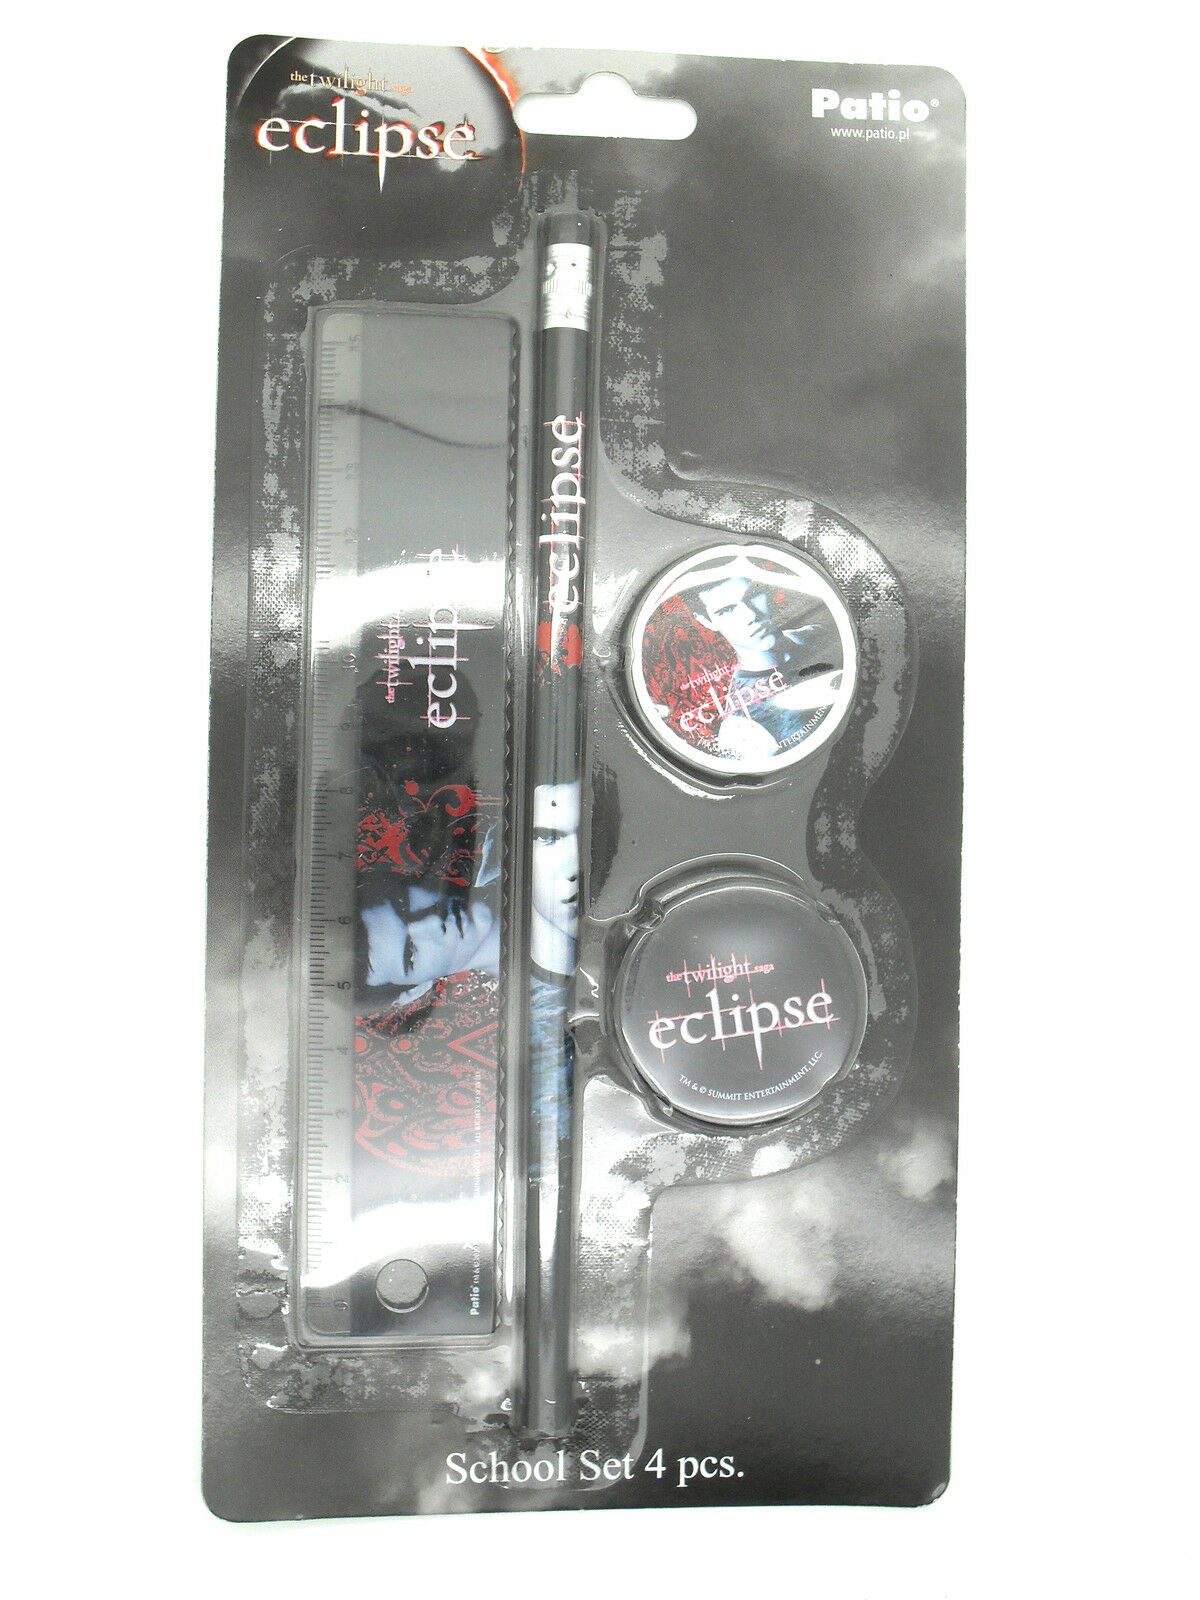 Kuli Spitzer Lineal 15 cm Radiergummi Staedtler student set: 2 Bleistifte HB